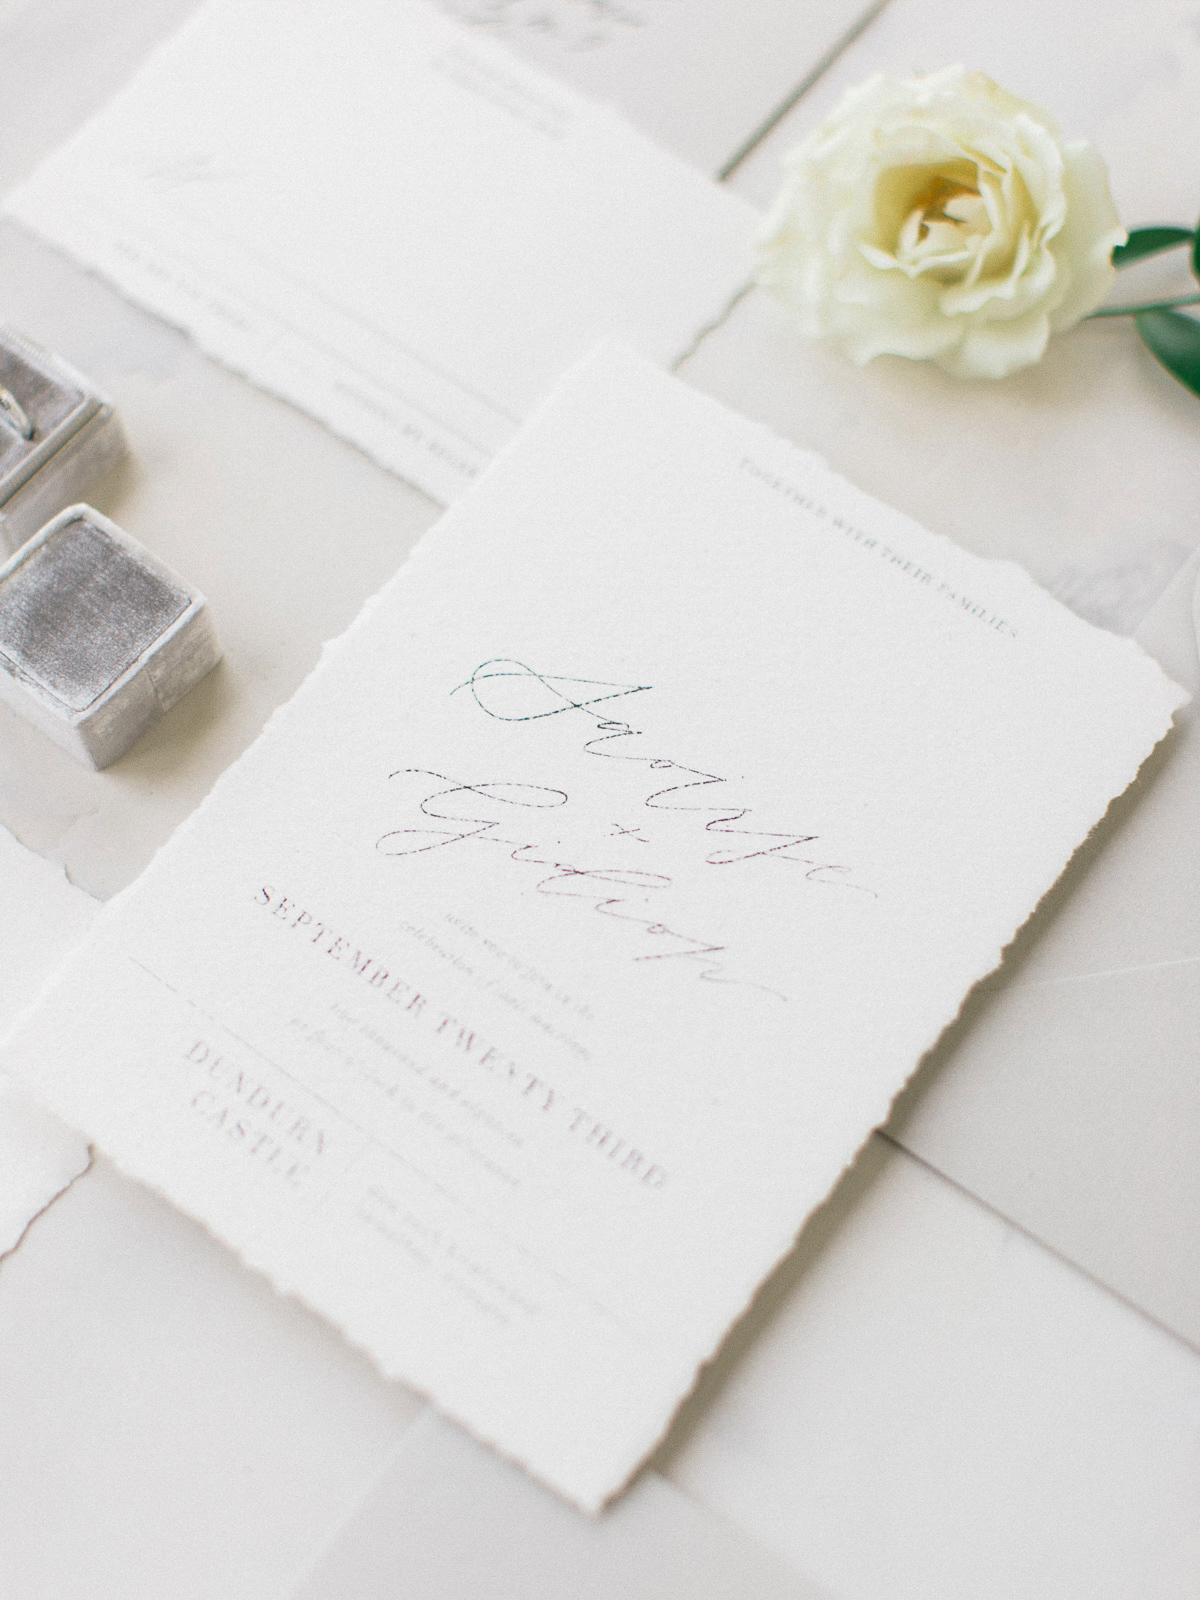 kurtz-orpia-photography-vineyard-bride-swish-list-dundurn-castle-dundas-wedding-editorial-7.jpg